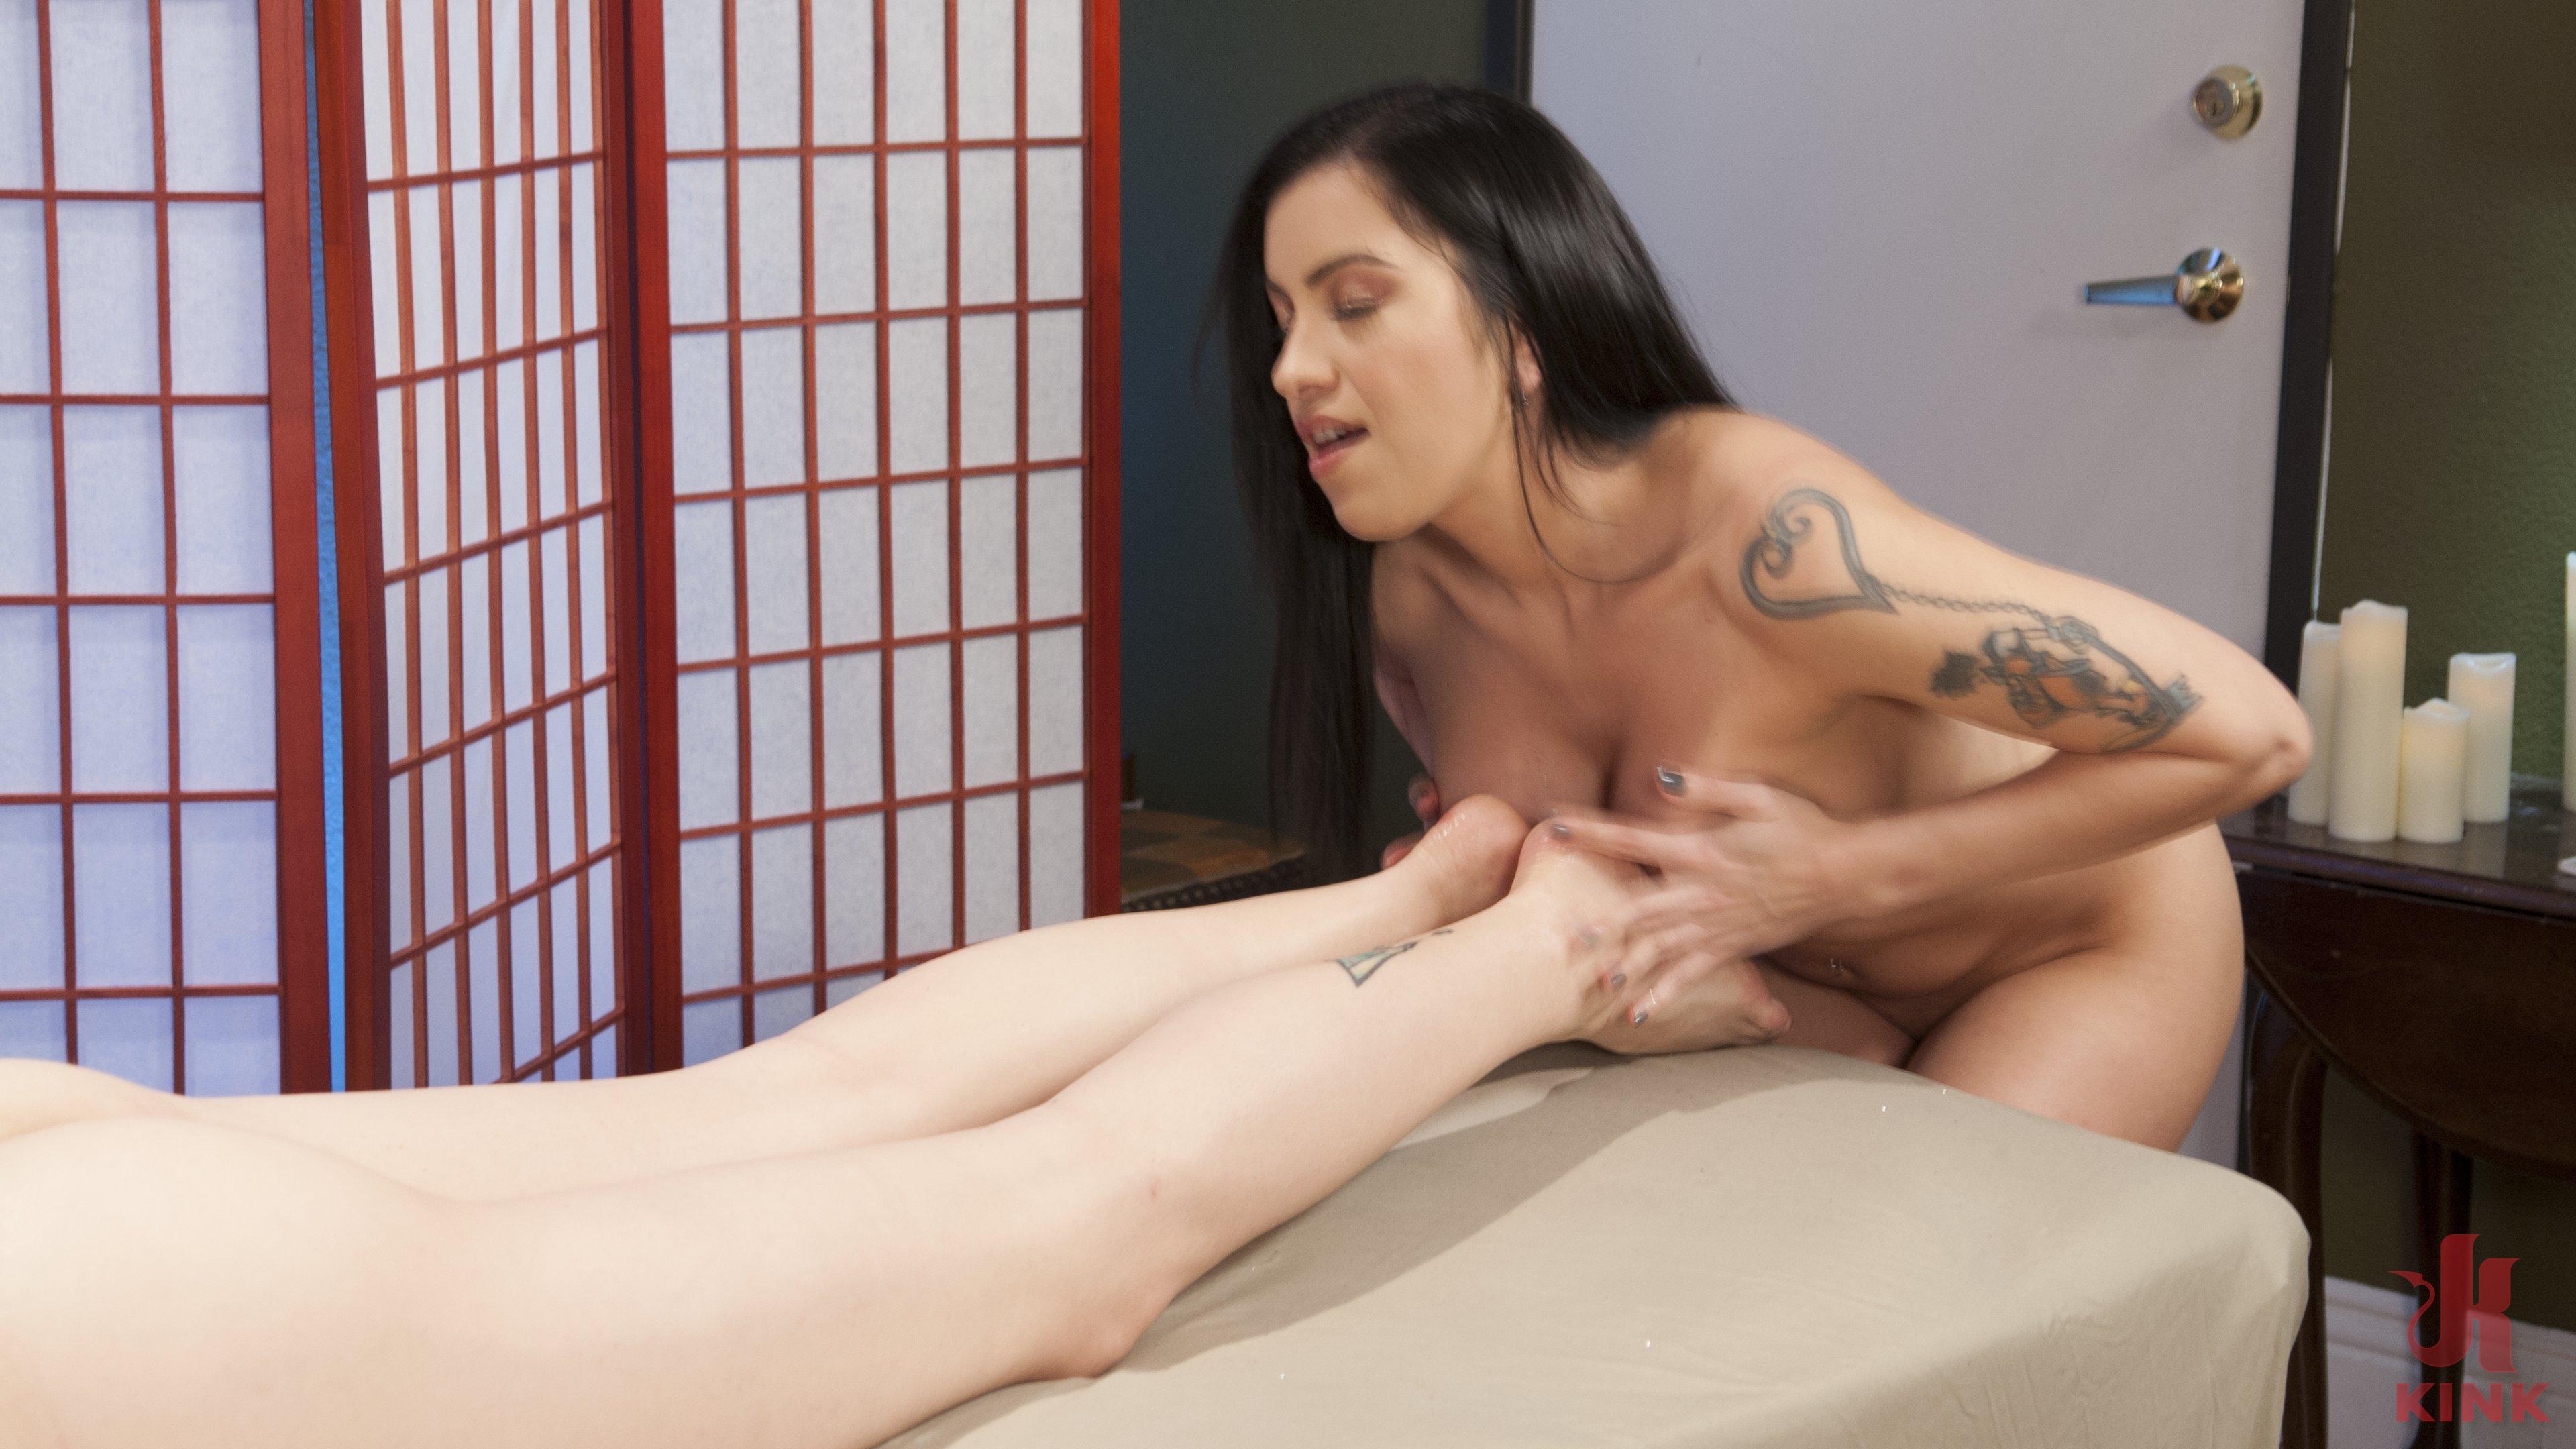 Nuru Masseuse Cassandra Cain Deep-Dicked by TS Client Casey Kisses